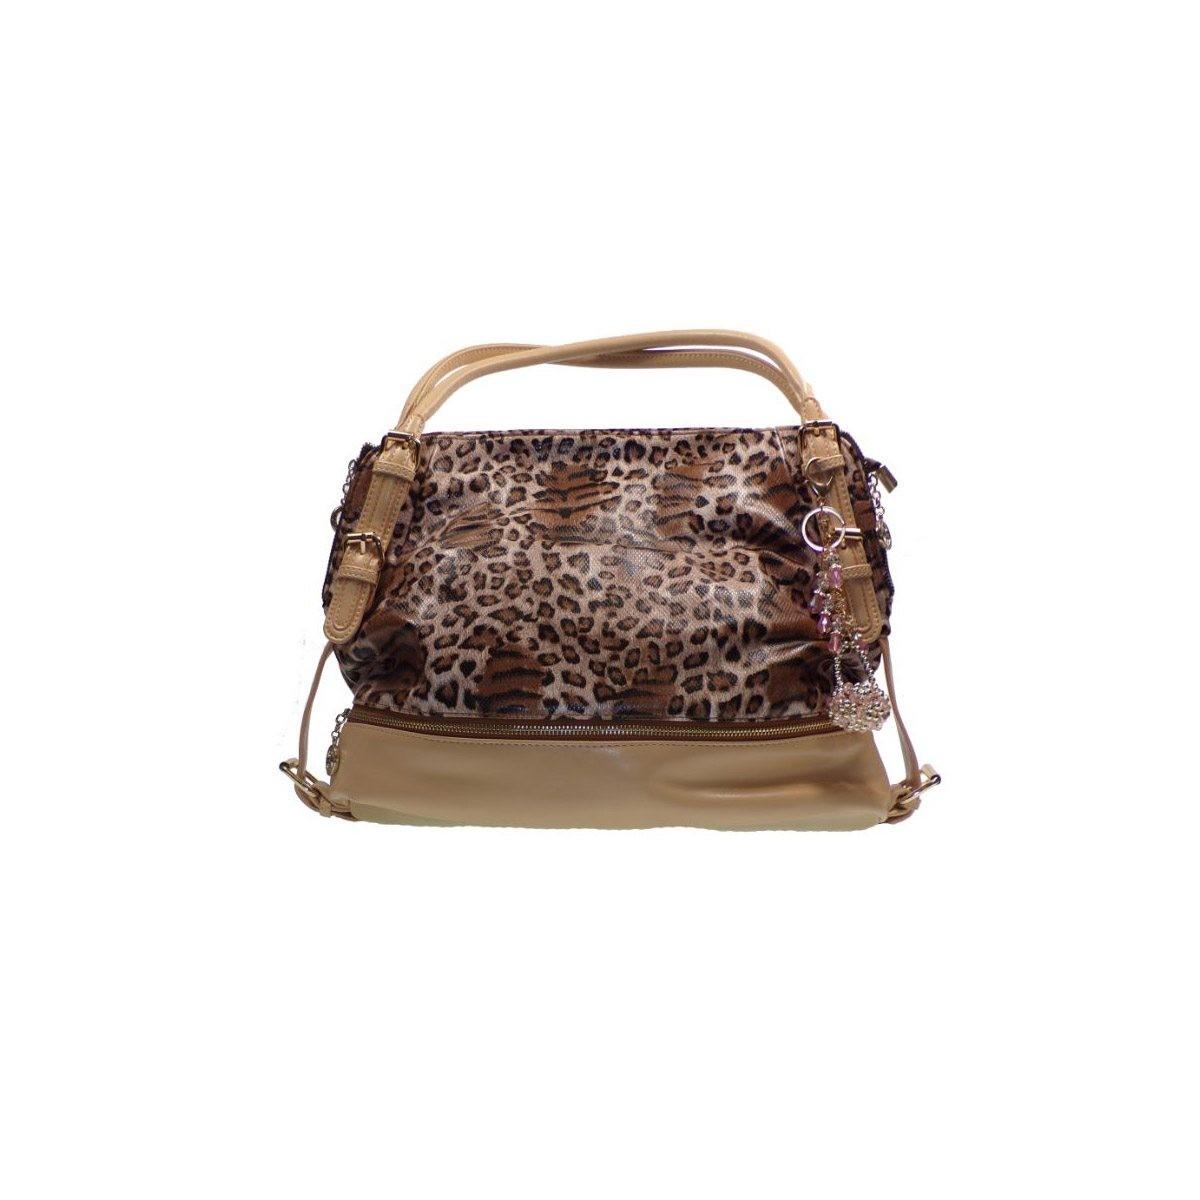 6ec0224460 BagiotaShoes EXE Bags Γυναικείες Τσάντες 20311-5 Λεοπάλ EXE 20311-5 leopal